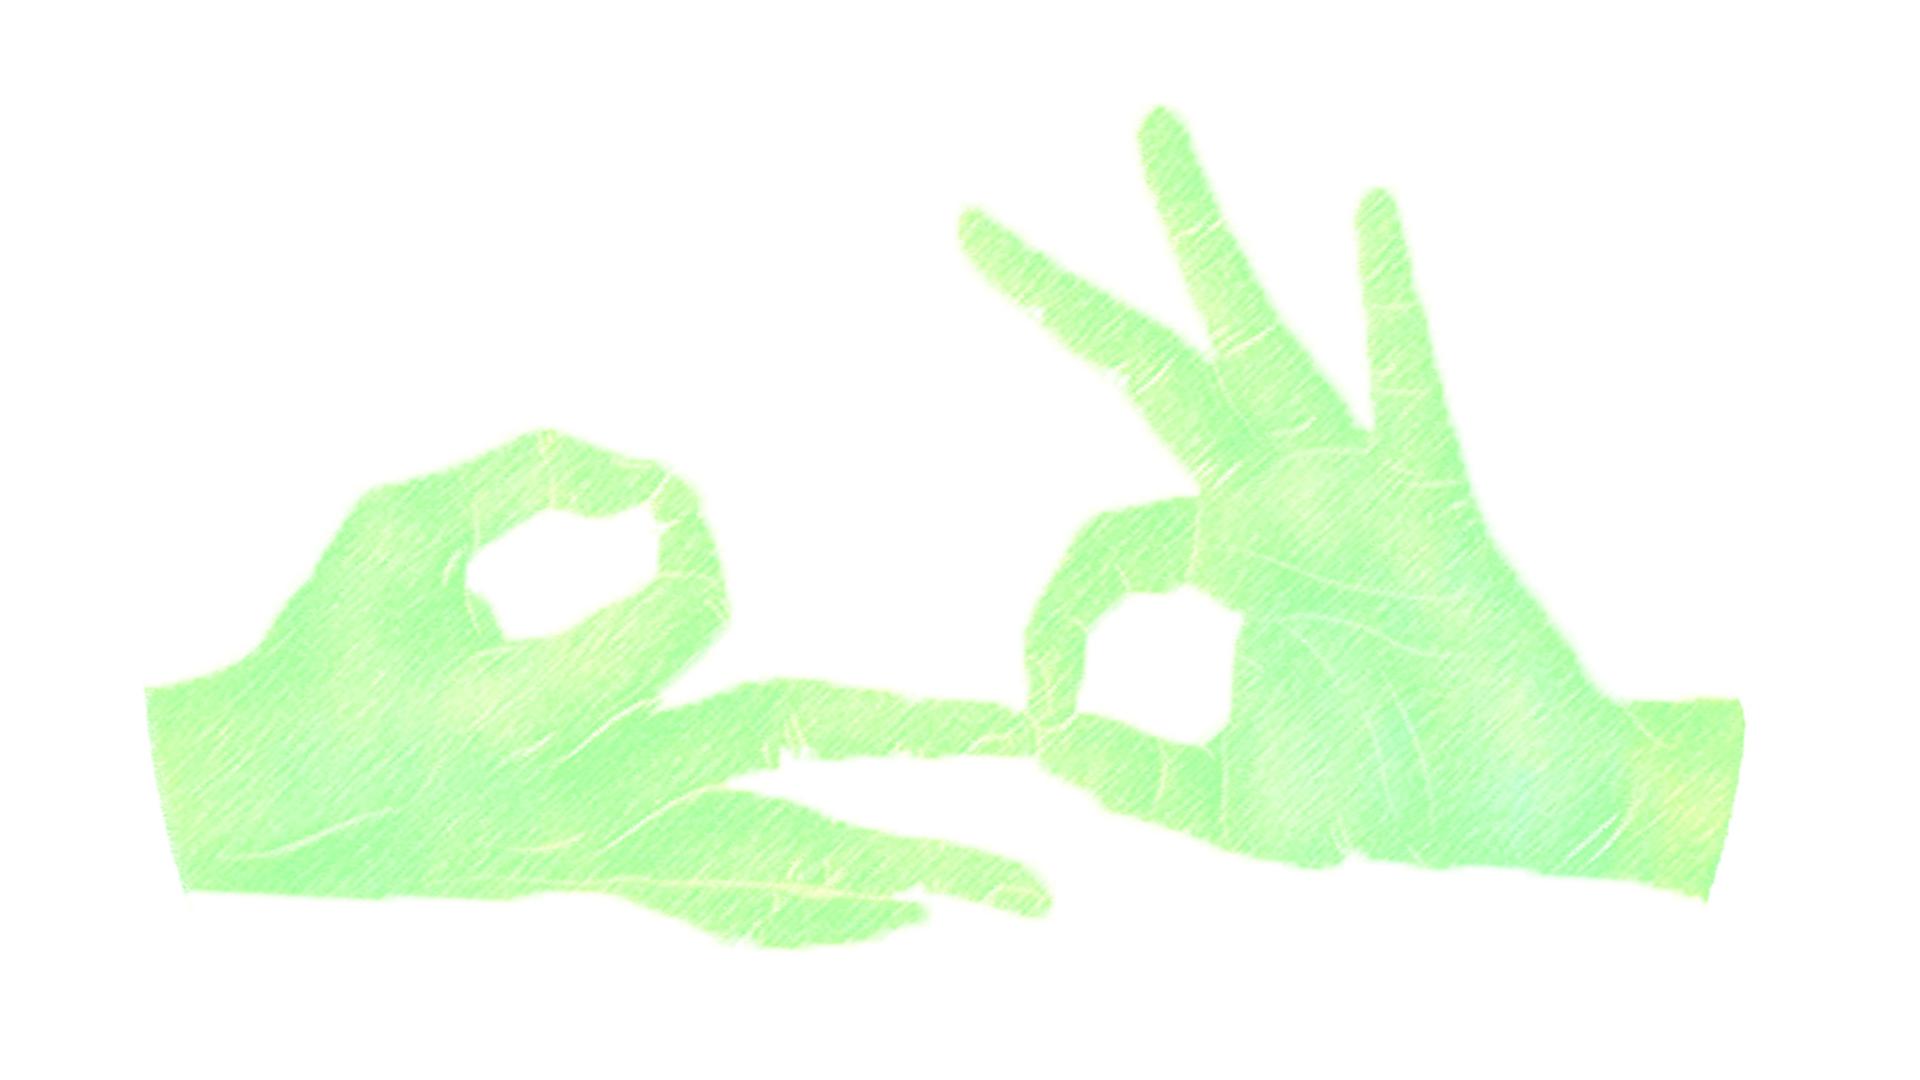 PANJA_hands.jpg